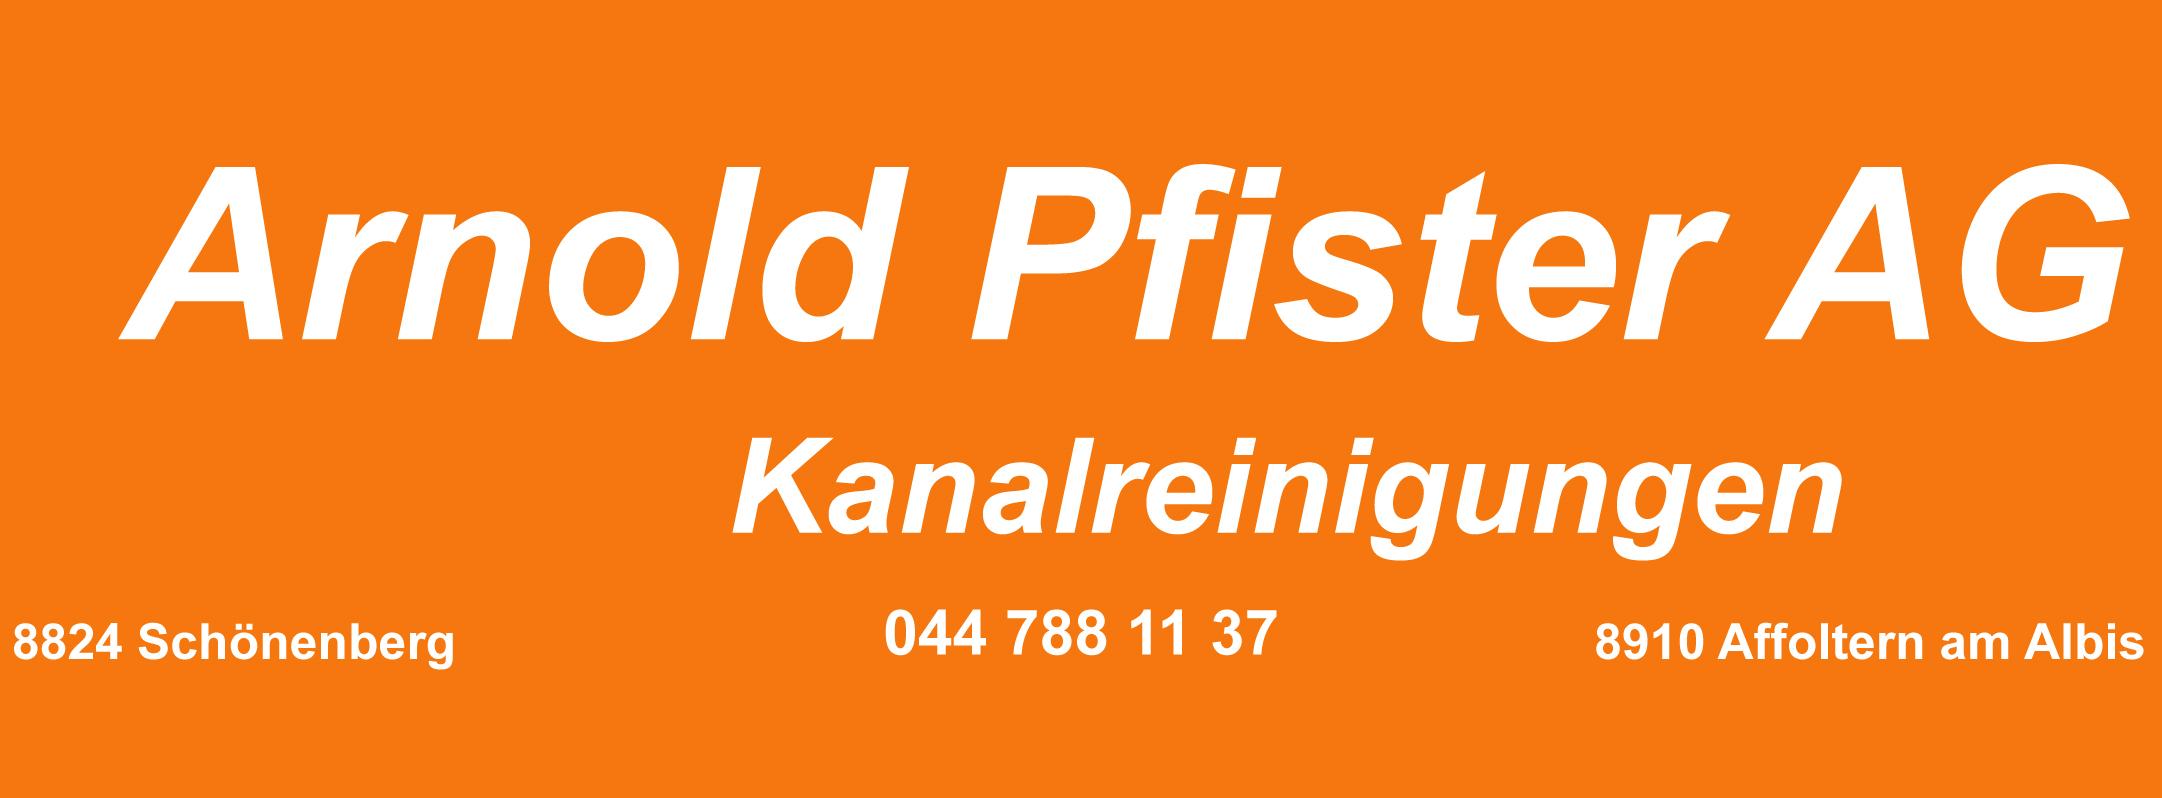 Arnold Pfister